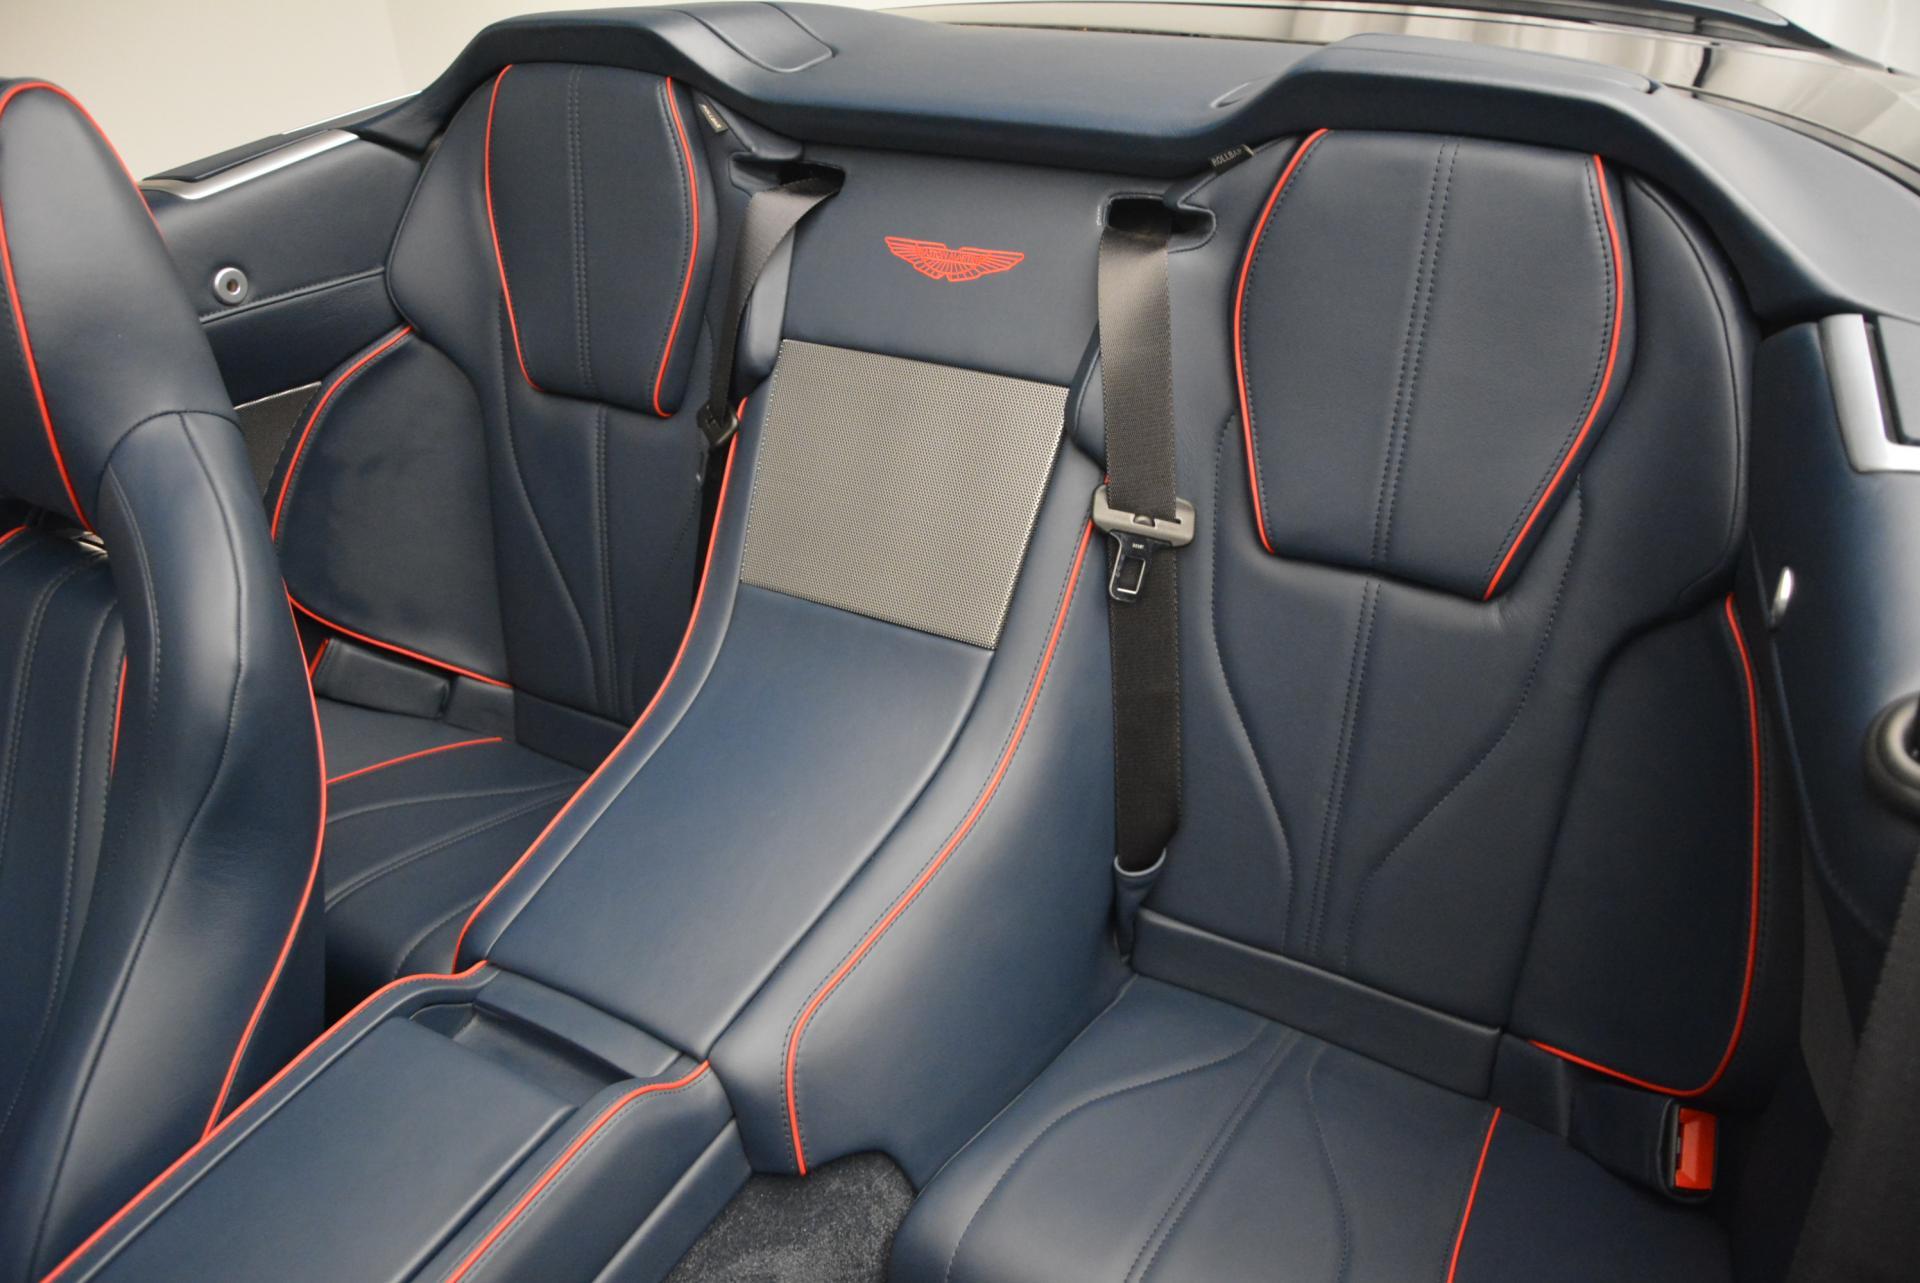 Used 2014 Aston Martin DB9 Volante For Sale In Westport, CT 519_p16